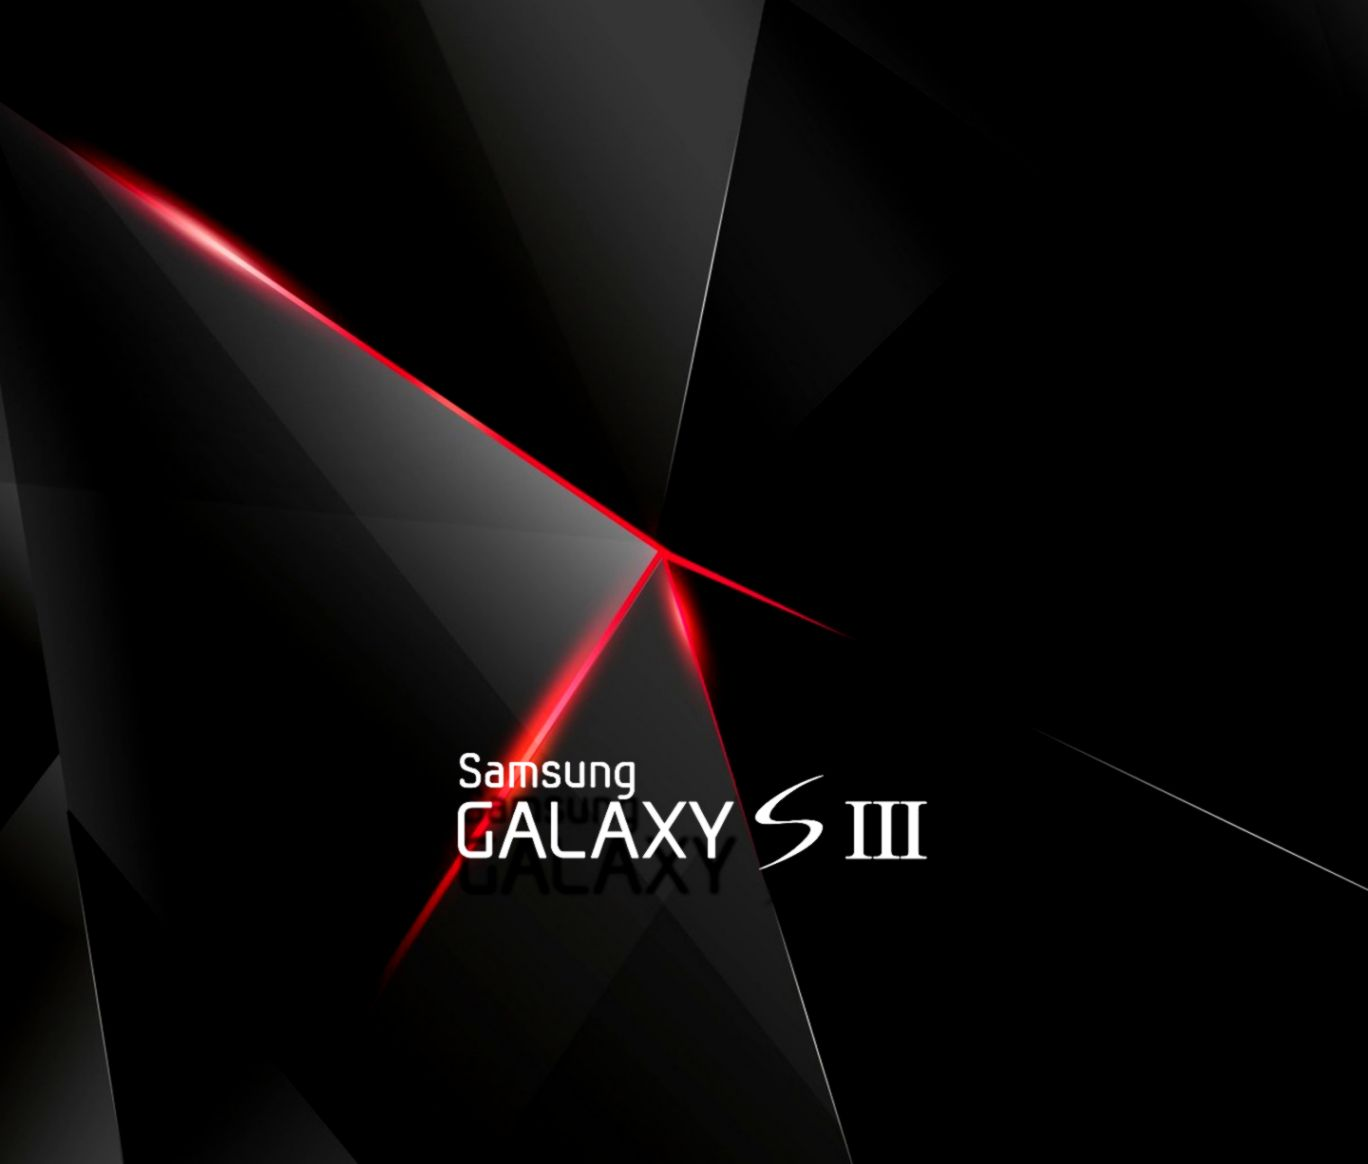 Samsung Galaxy S3 HD Wallpapers 36N719F Picserio   Picseriocom 1368x1164